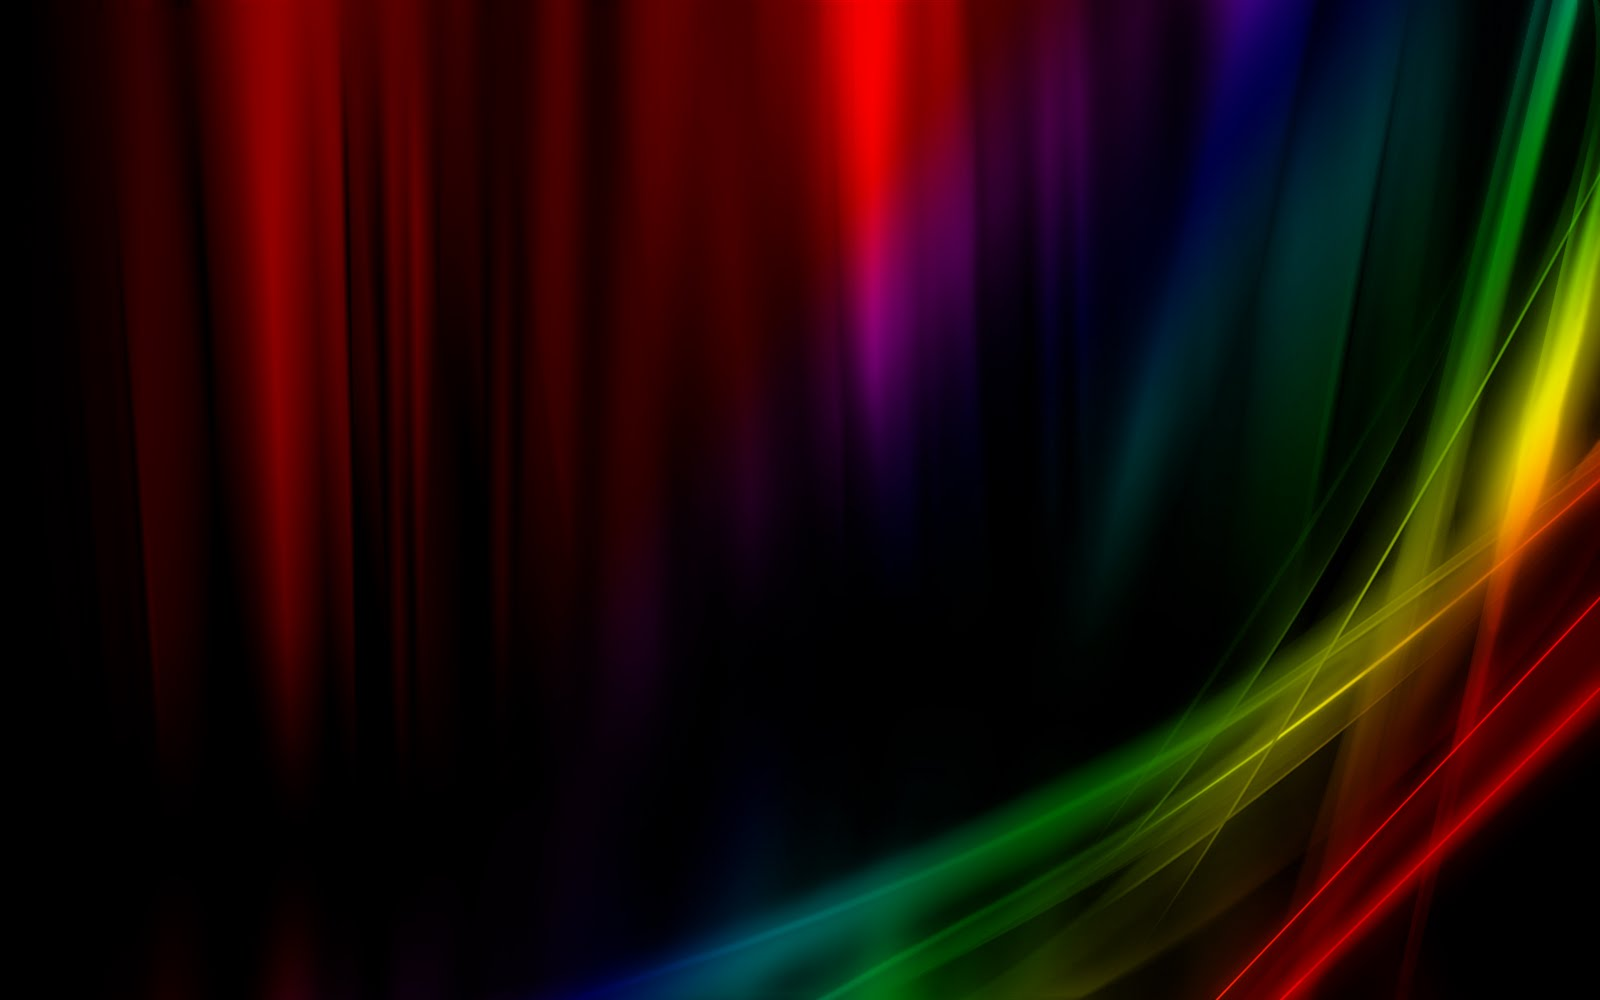 Artistic Colors   High Resolution 1920 x 1200 Hd Desktop Wallpaper 1600x1000